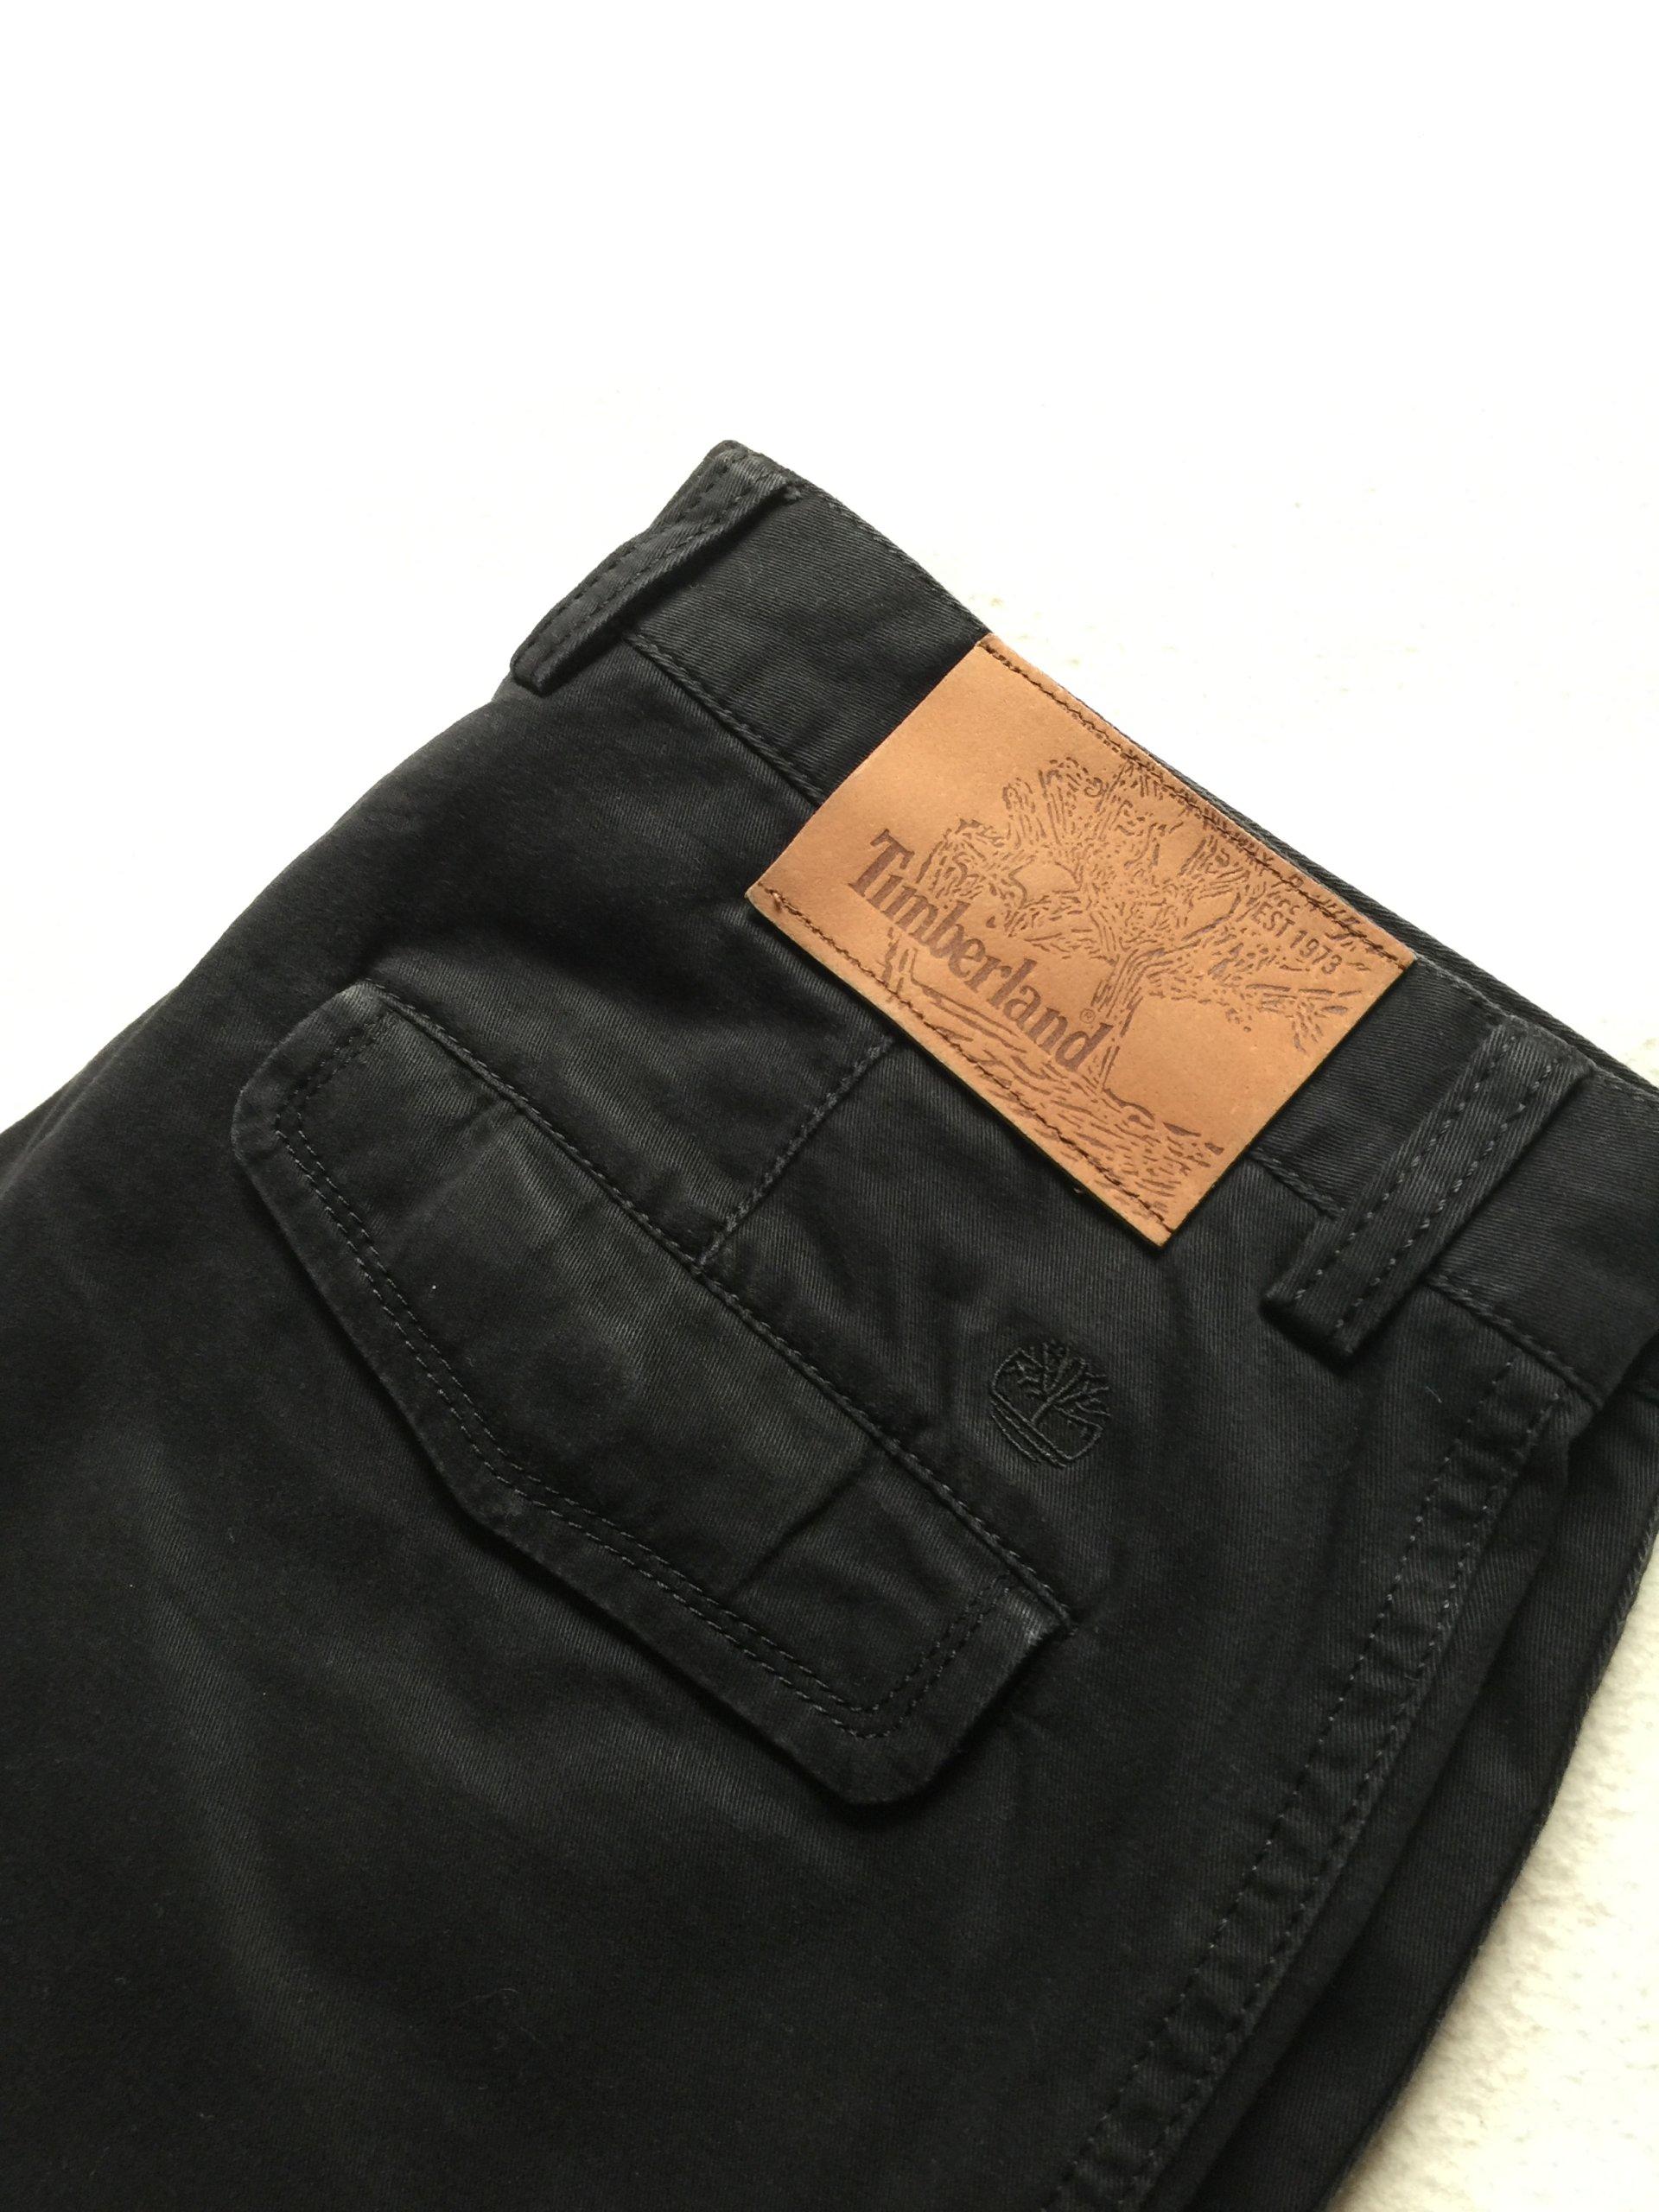 Spodnie Timberland rozmiar 32 Tanio!